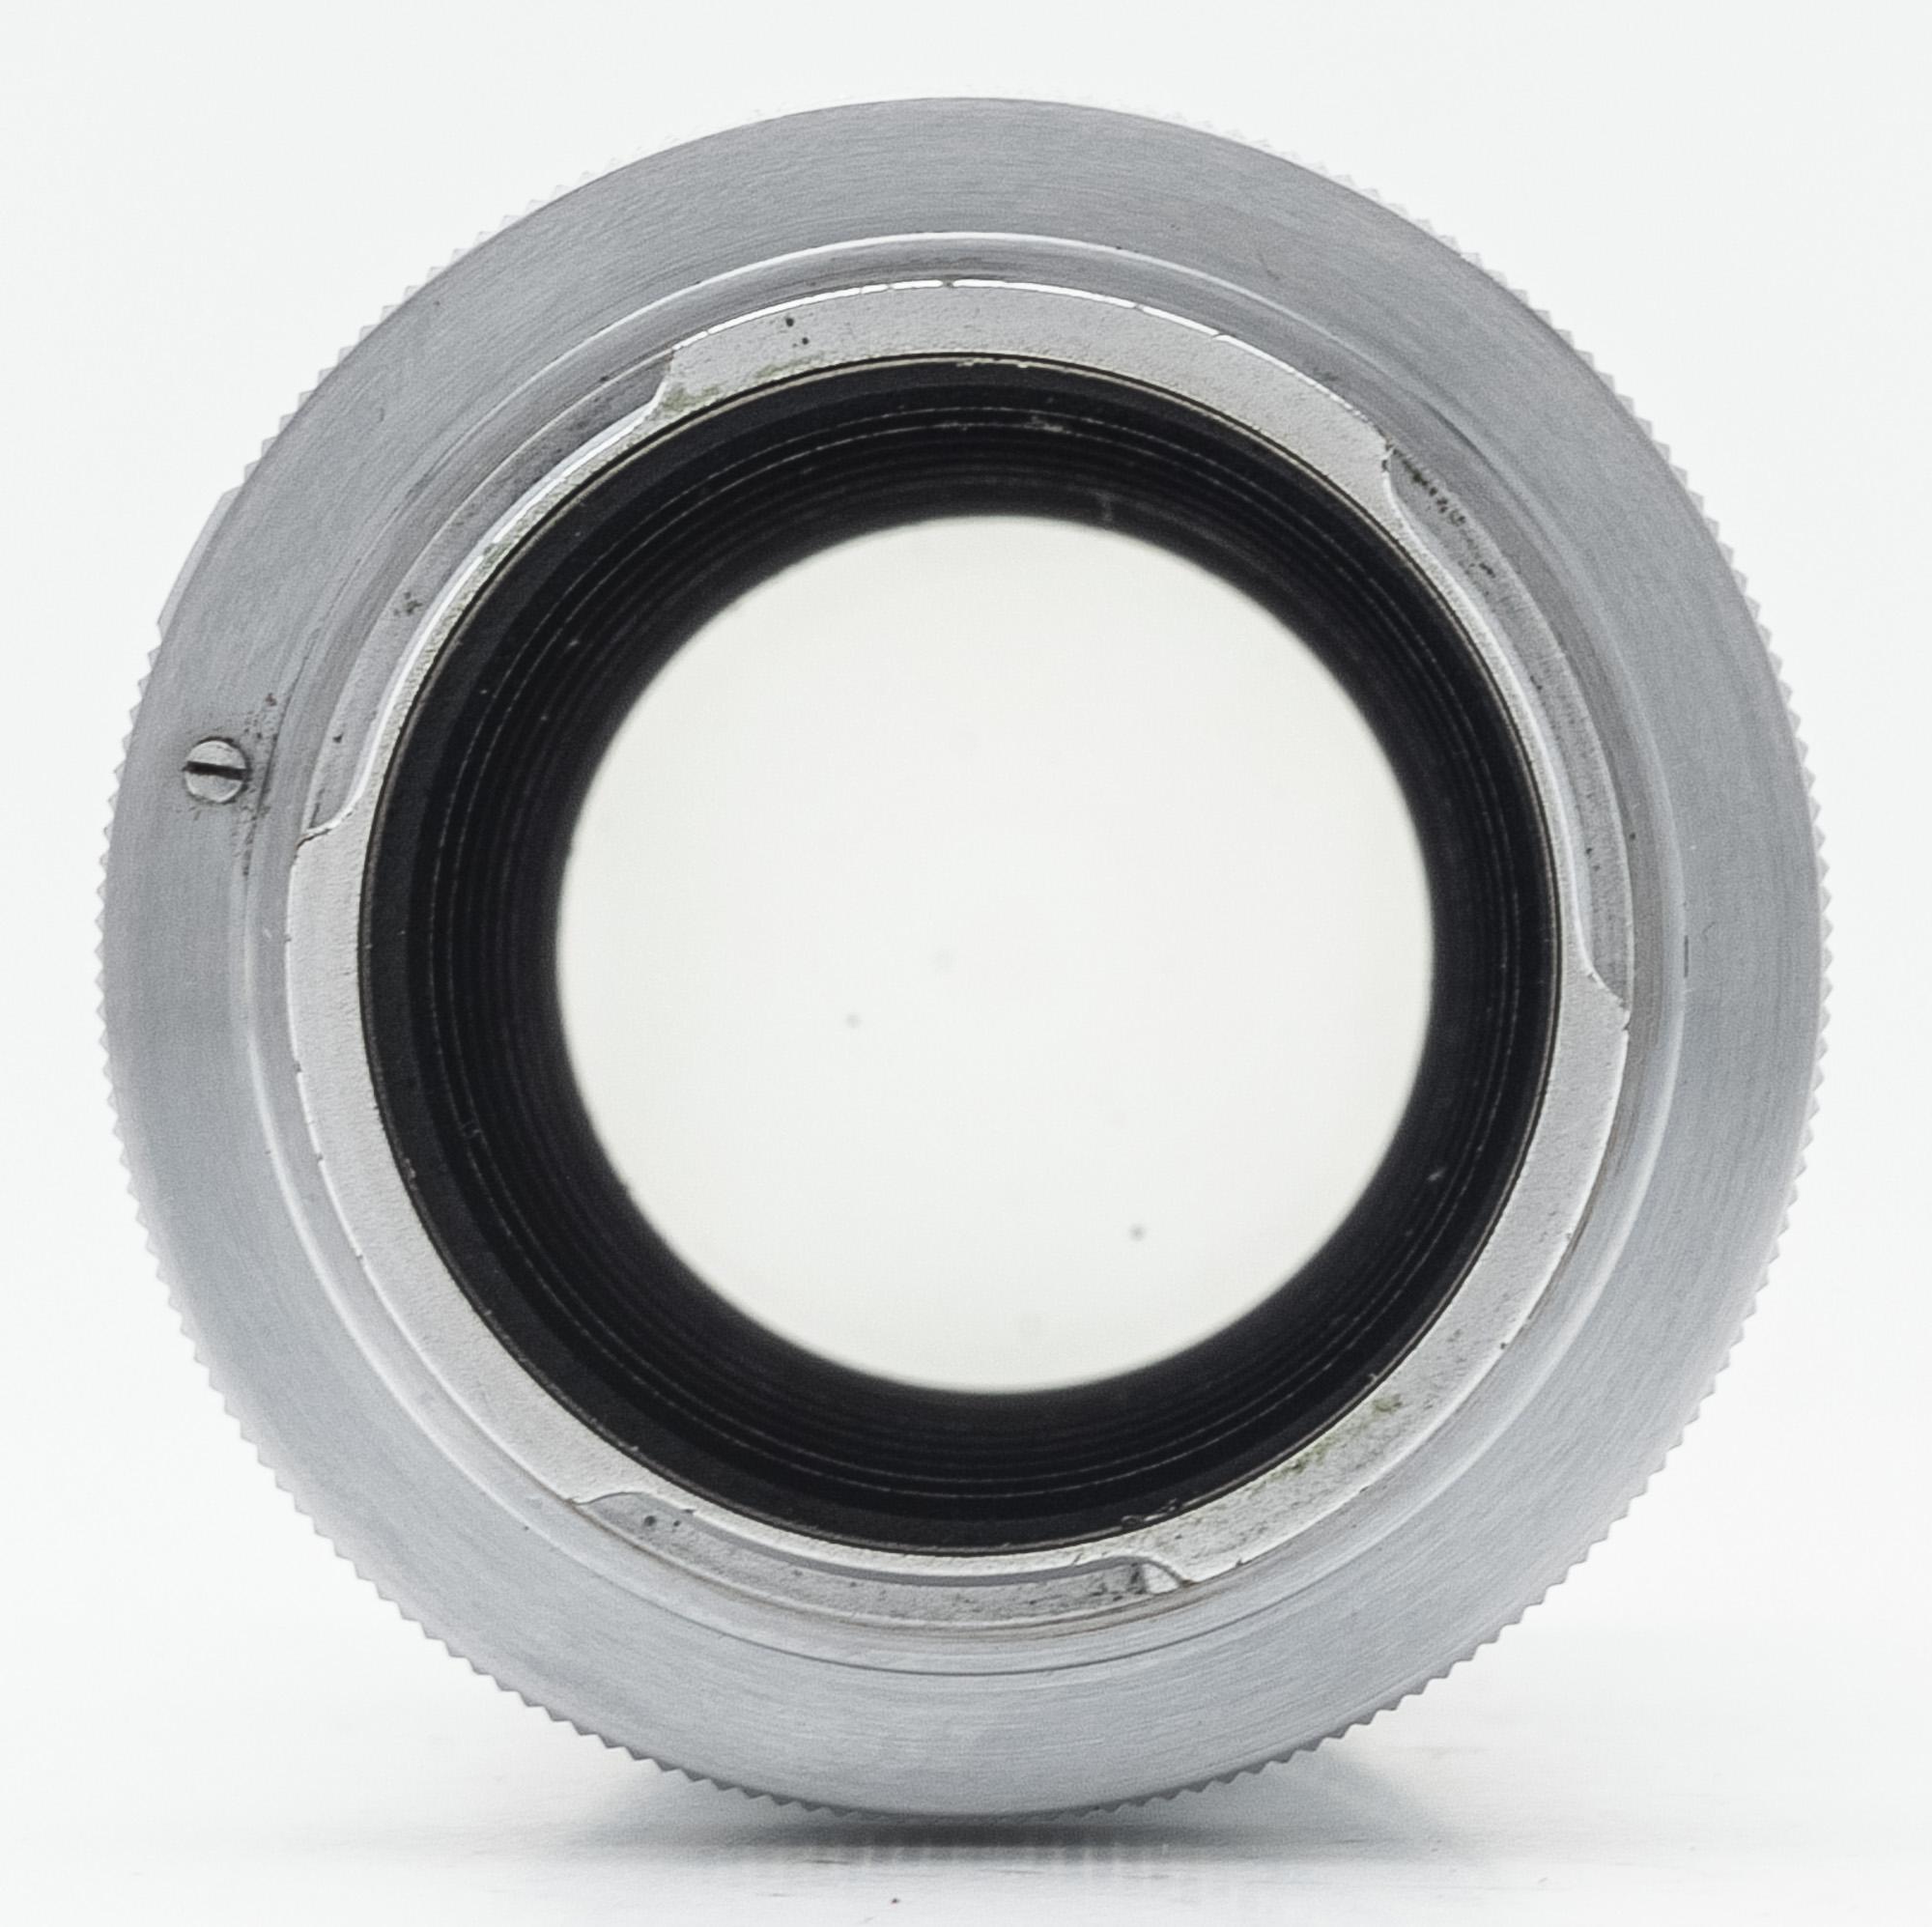 Carl Zeiss Jena Triotar T 13.5cm 13.5 Cm 135mm 135 Mm 1:4